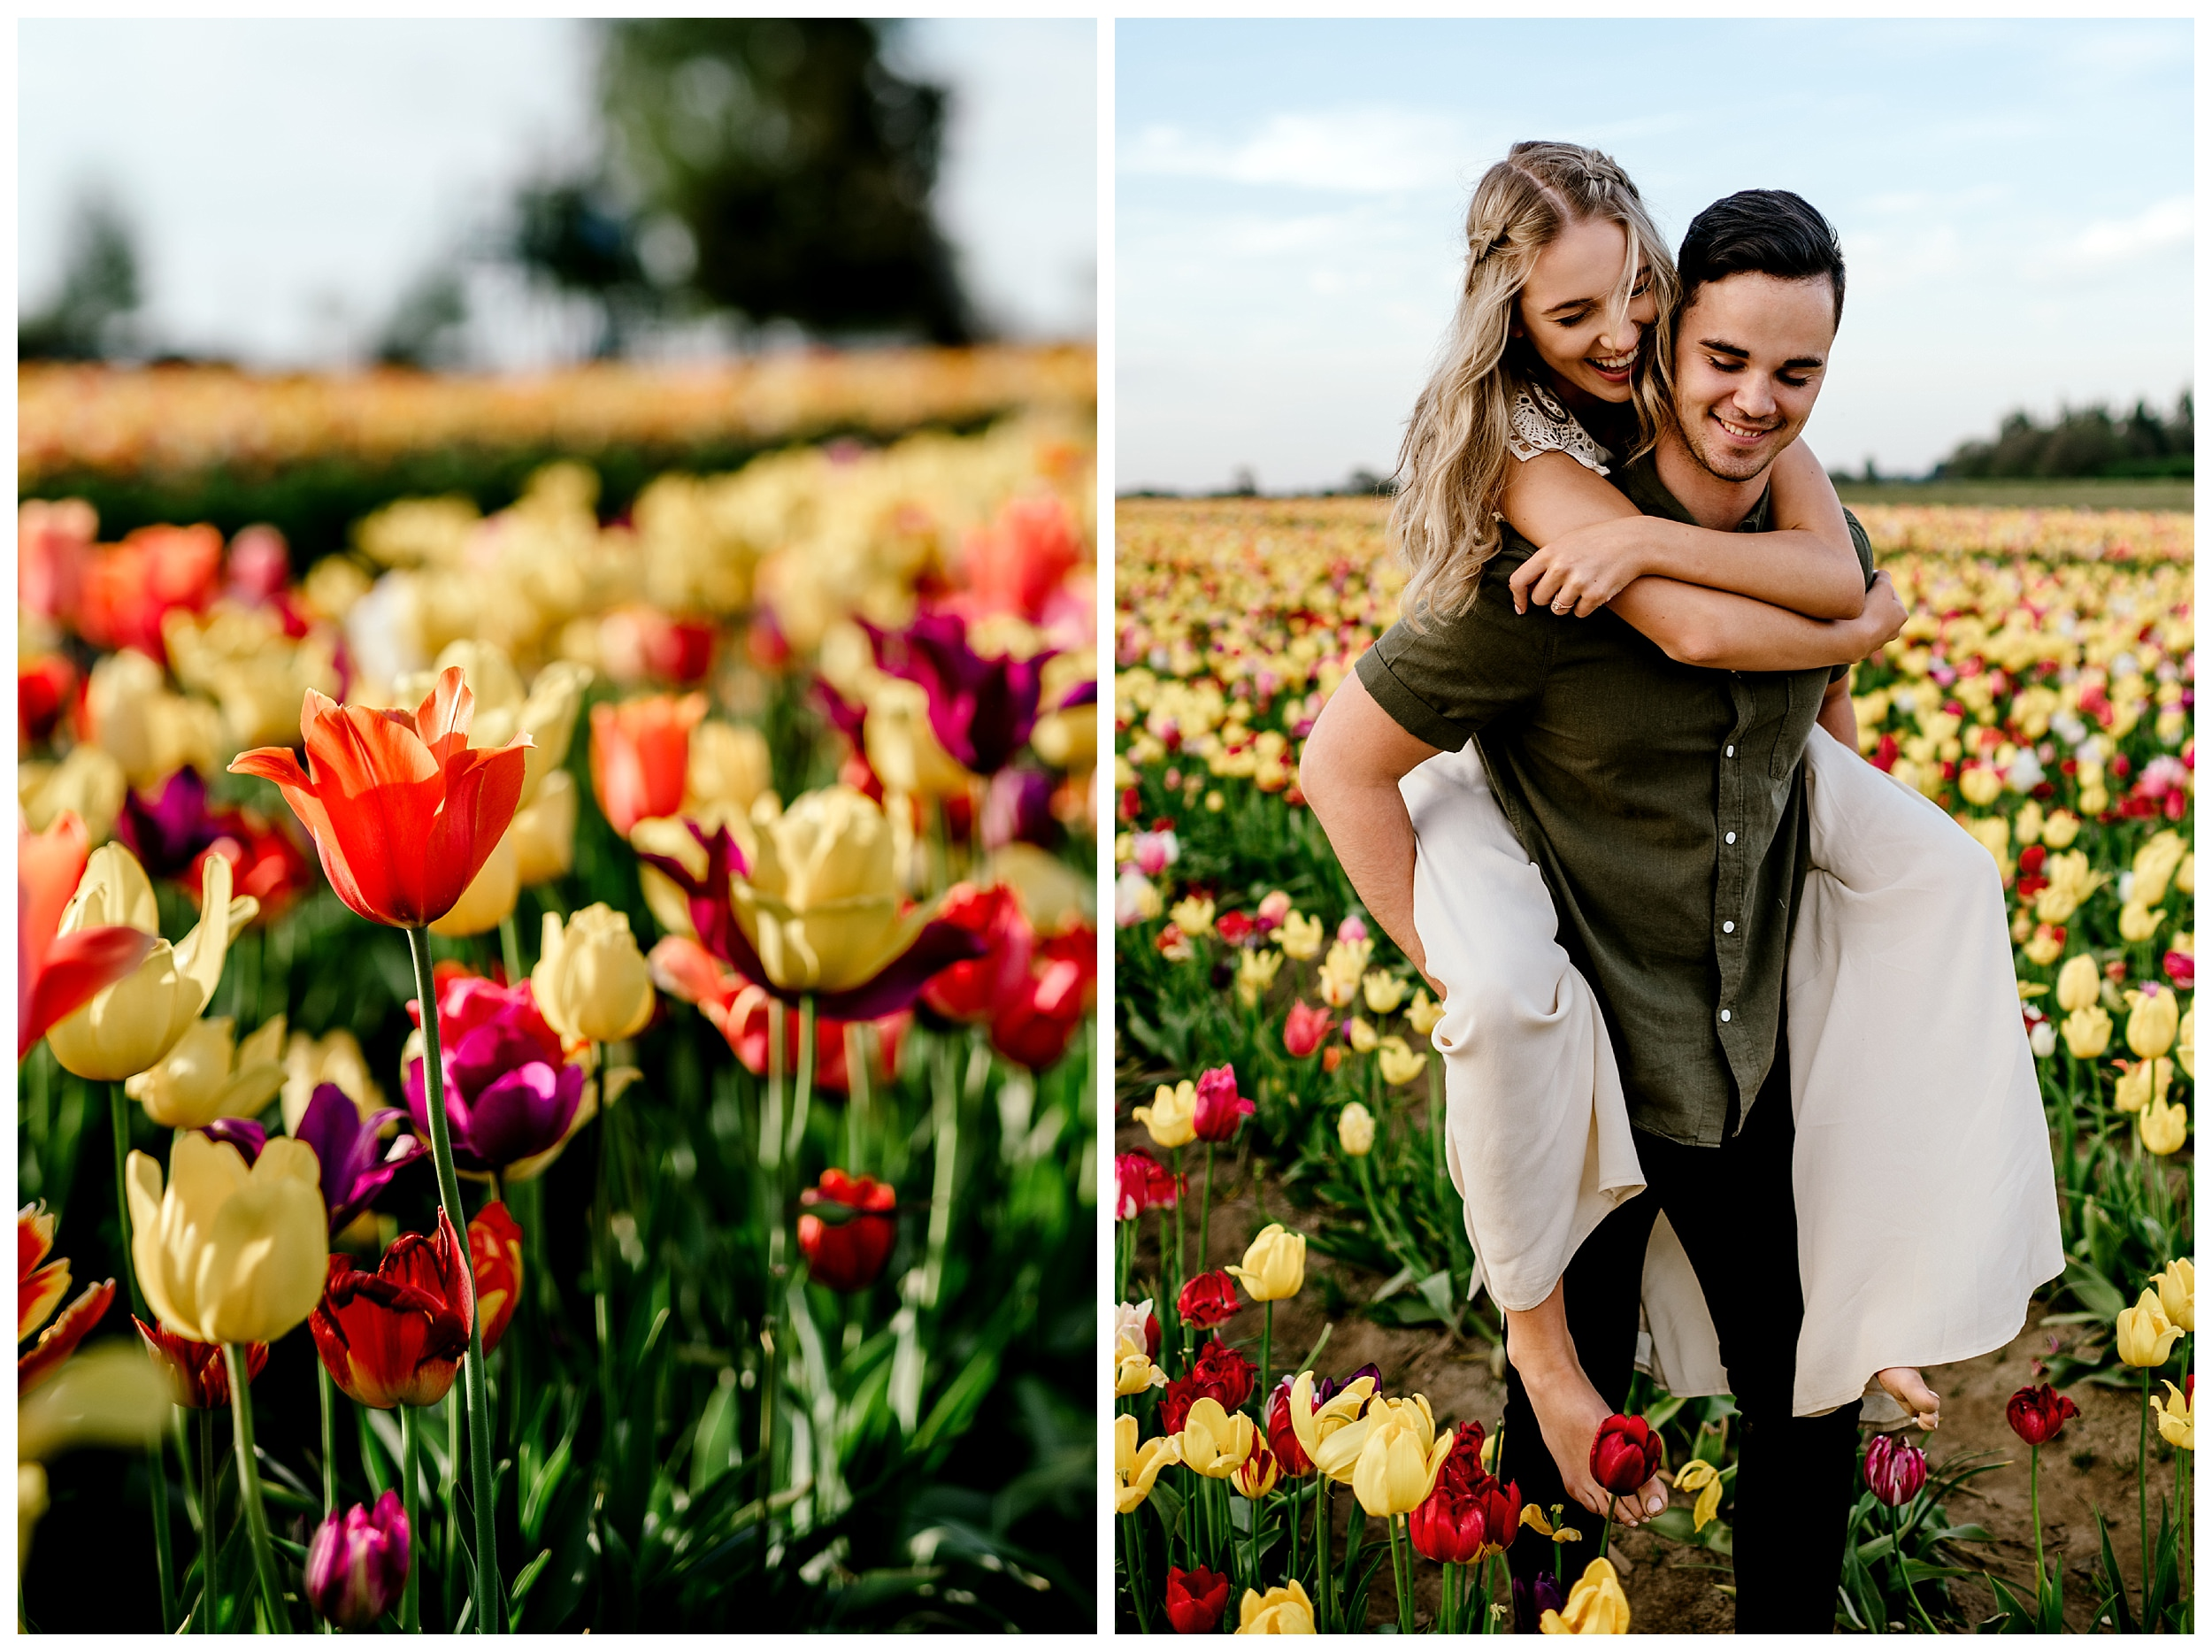 Tulip-field-engagement-session-Portland-Photographer-10.jpg